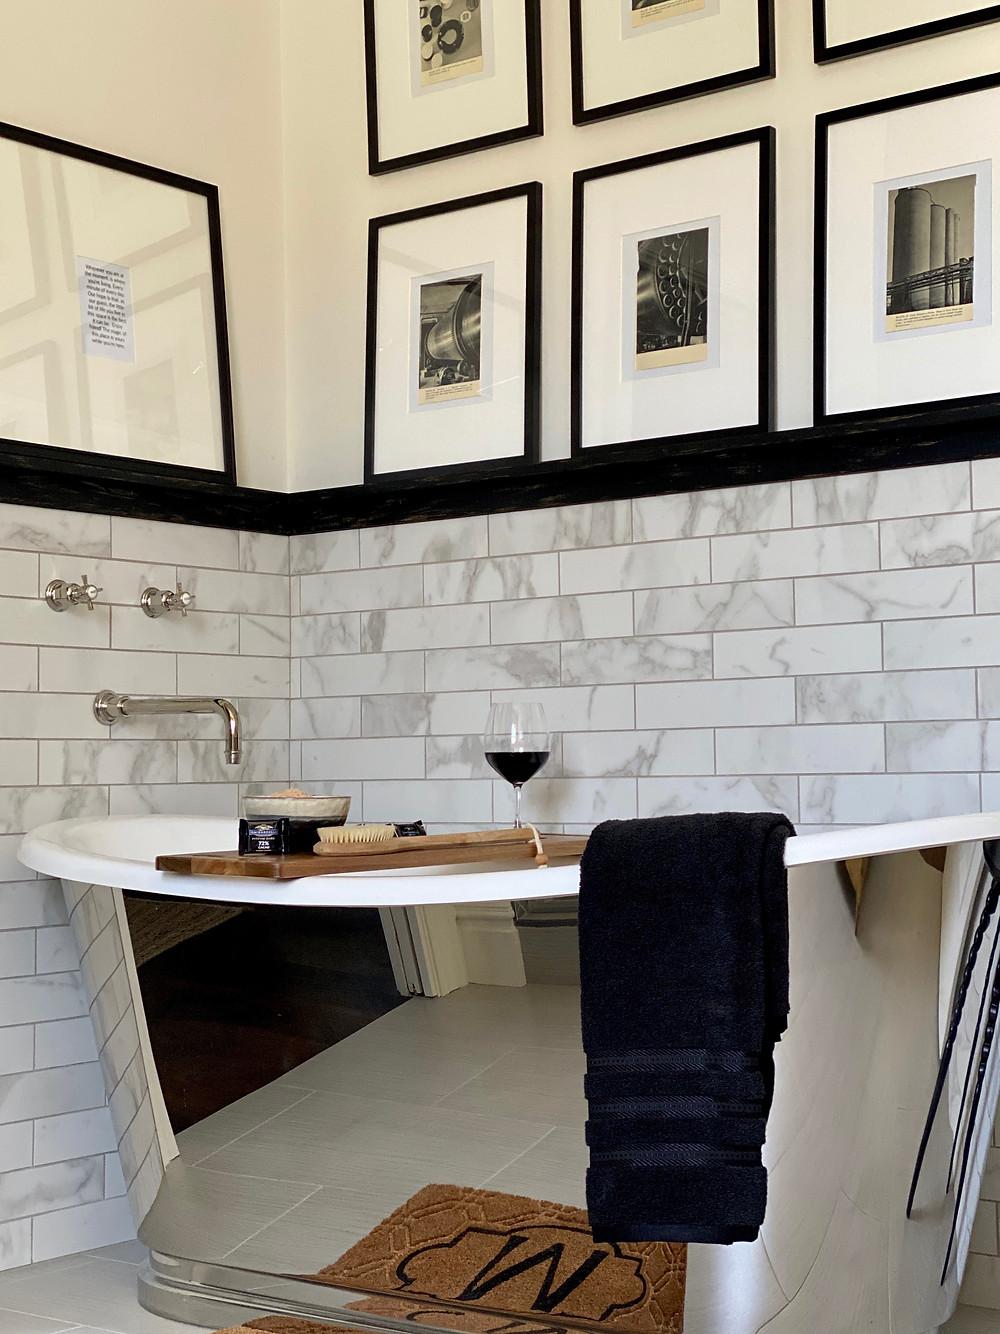 Stainless steel tub, black and white bathroom, spa bath, beautiful bathrooms